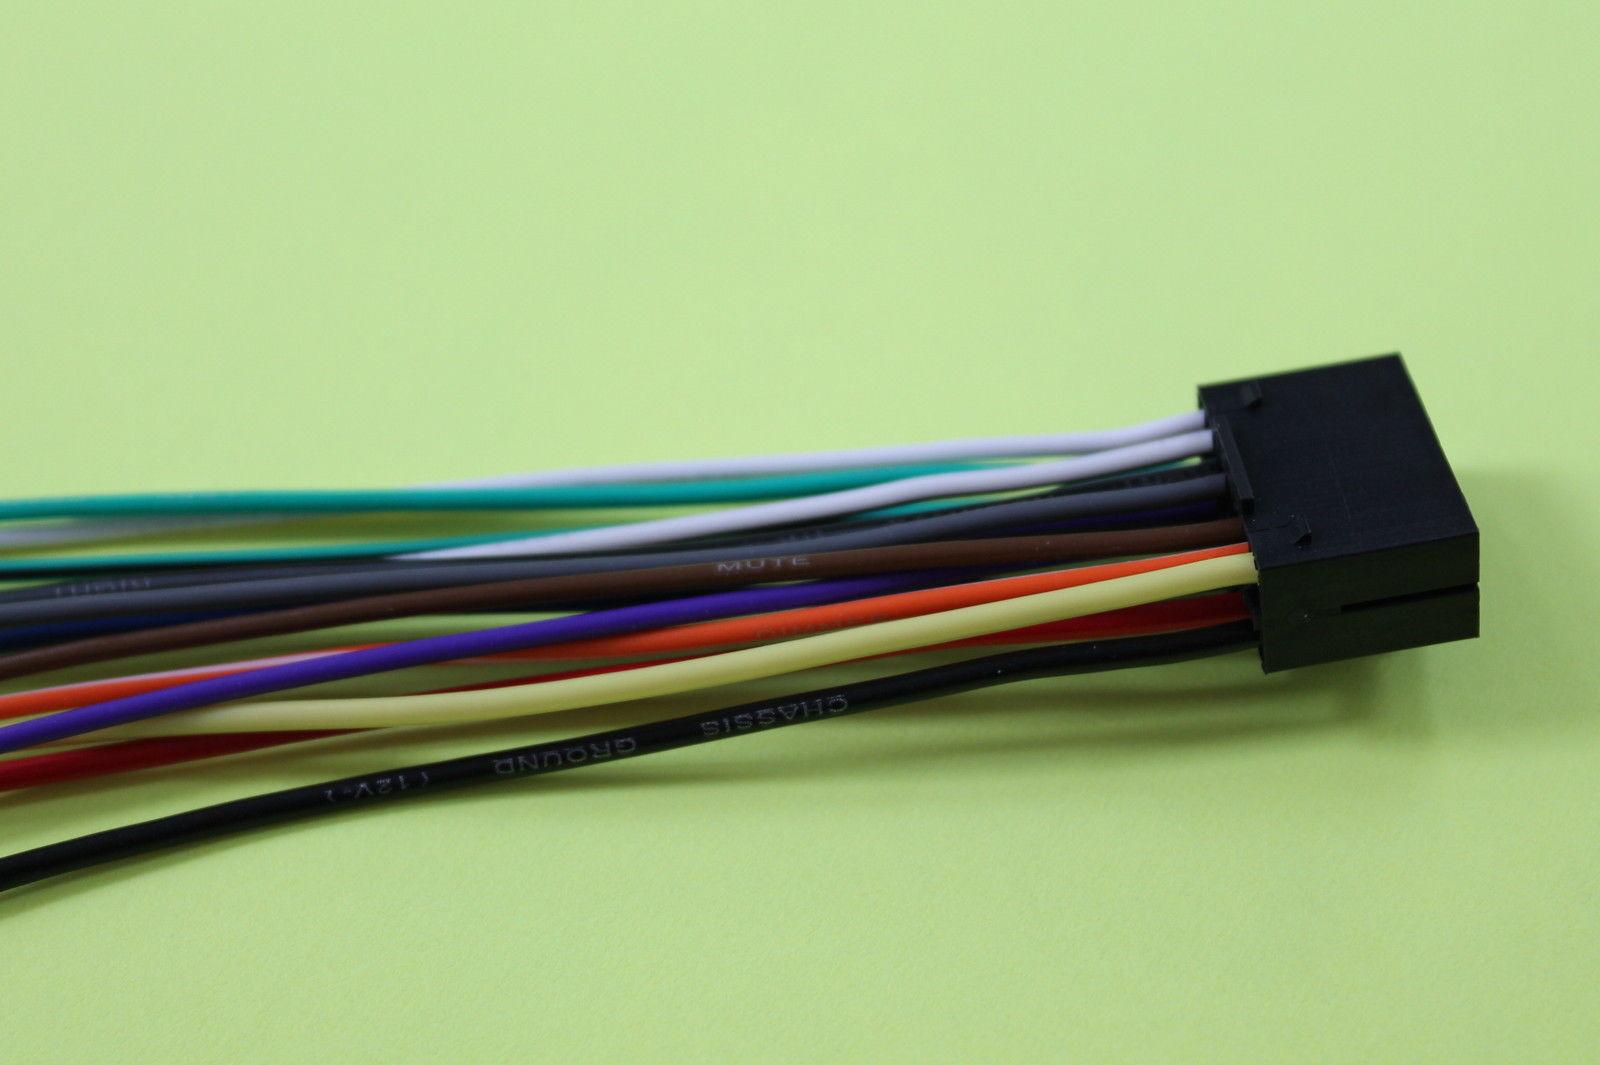 wire harness for jvc kd s38 includes 1 and 50 similar items rh bonanza com JVC Wiring Harness Diagram JVC KD R330 Wiring-Diagram